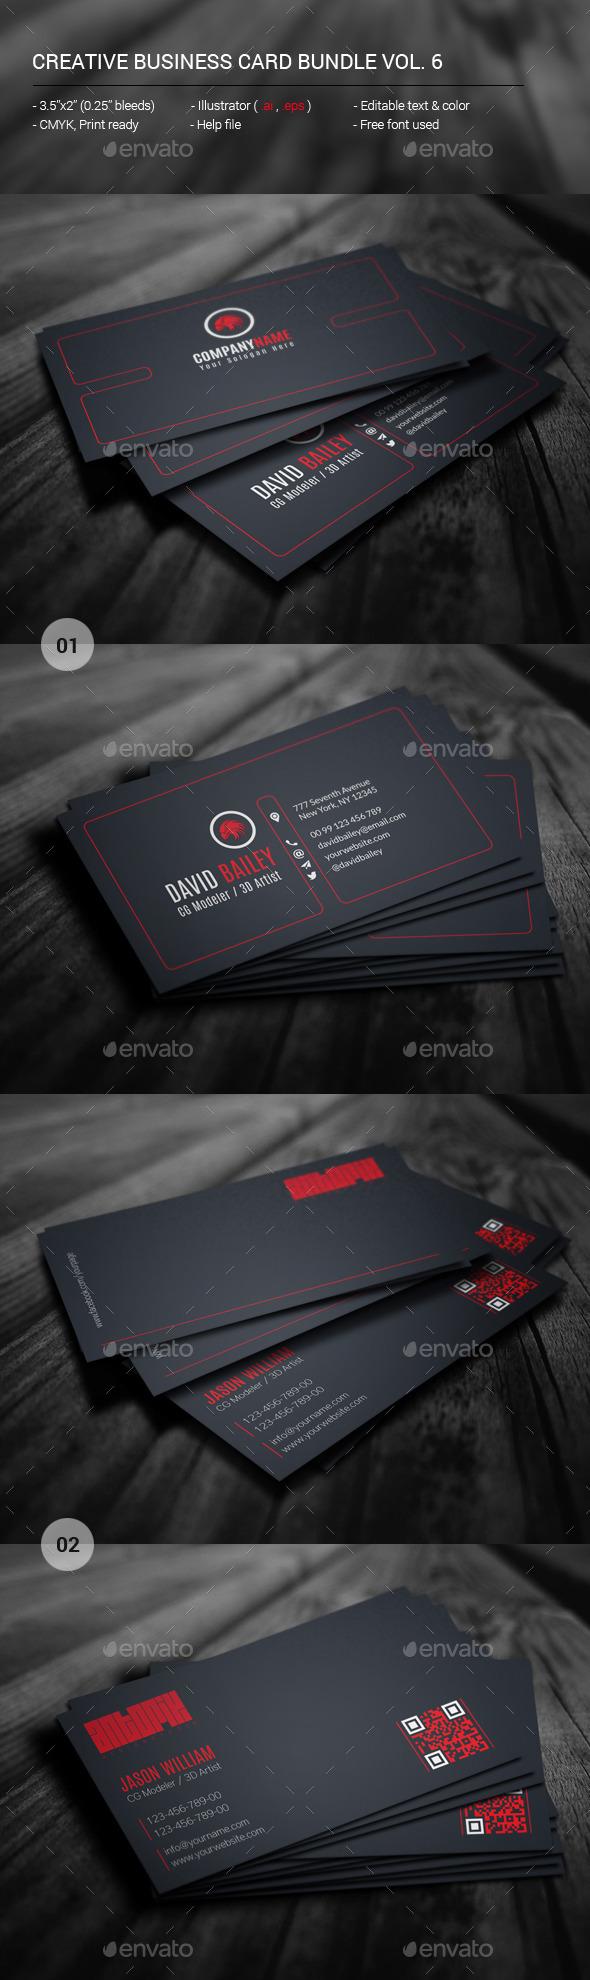 Creative Business Card Bundle Vol. 6 - Creative Business Cards